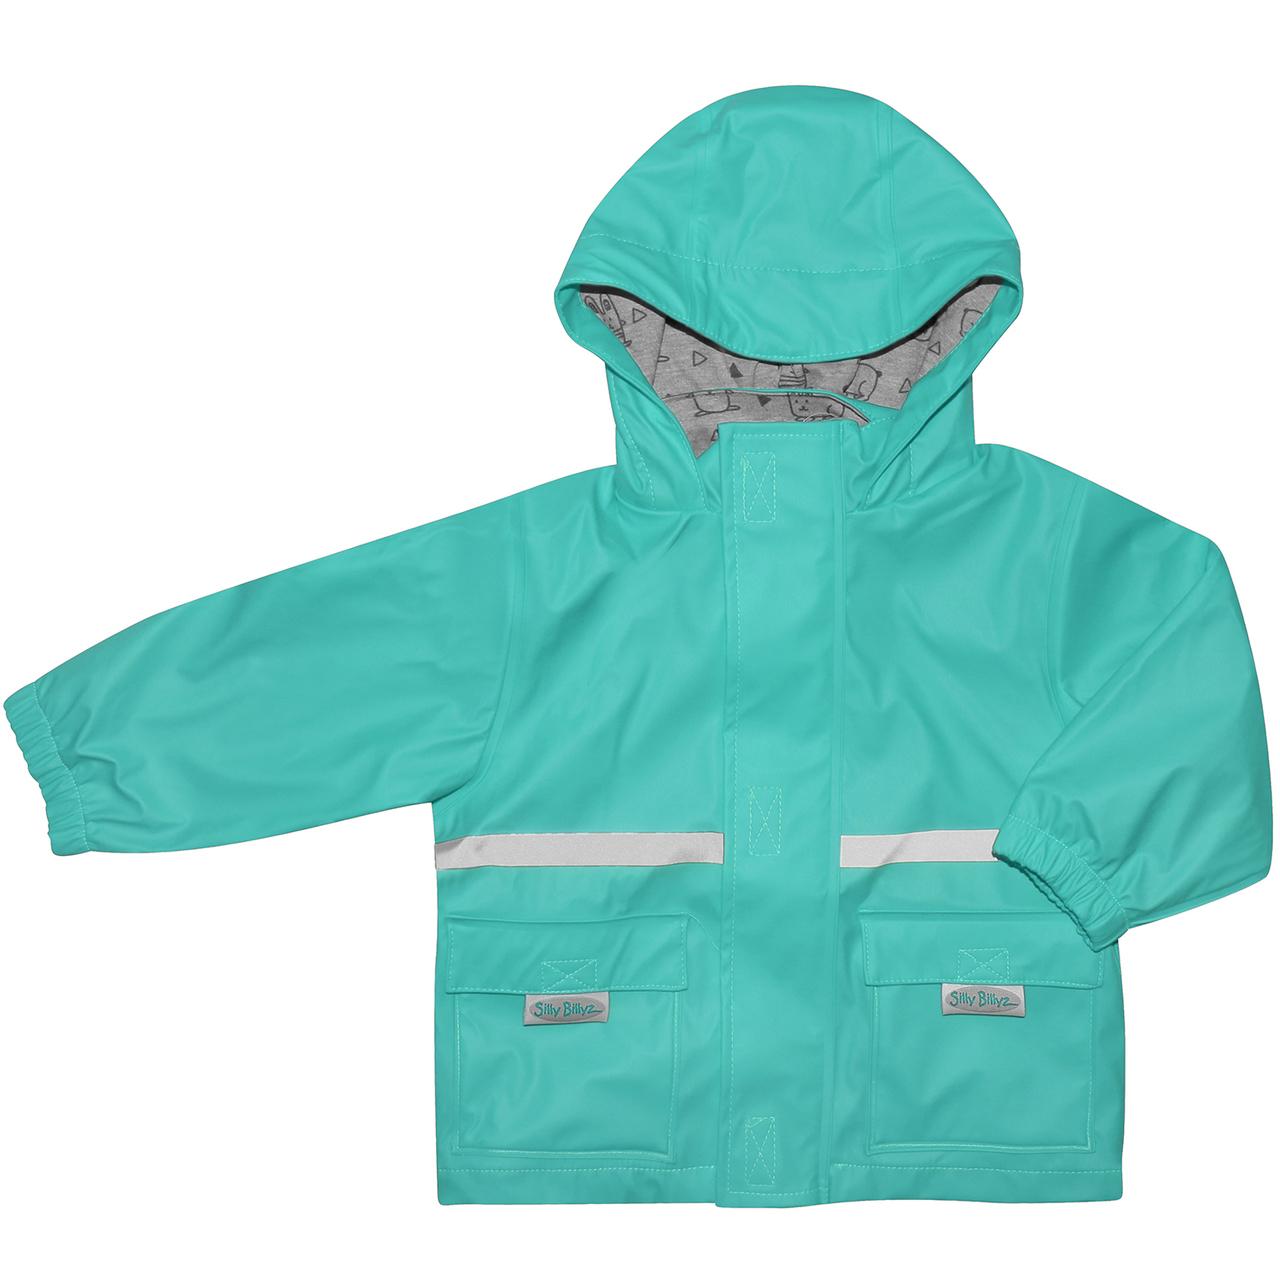 Silly Billyz Waterproof Jacket - Aqua (3-4 Yrs) image